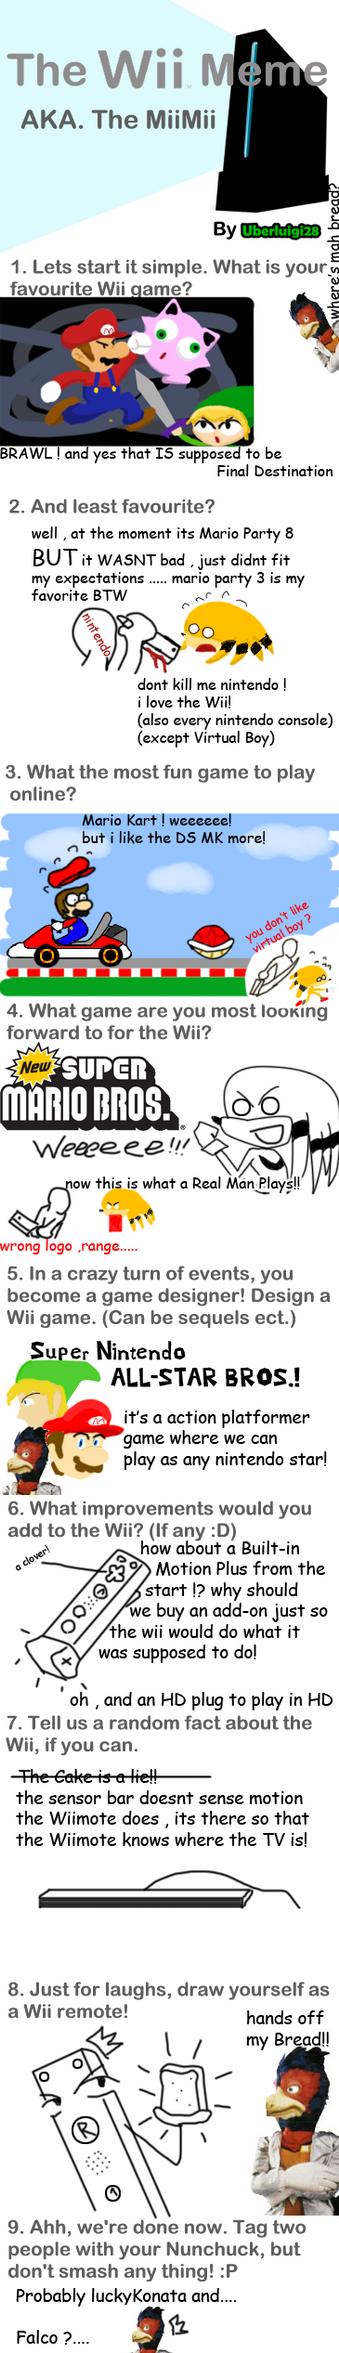 Wii Mii Mii a meme by me by rangeTE